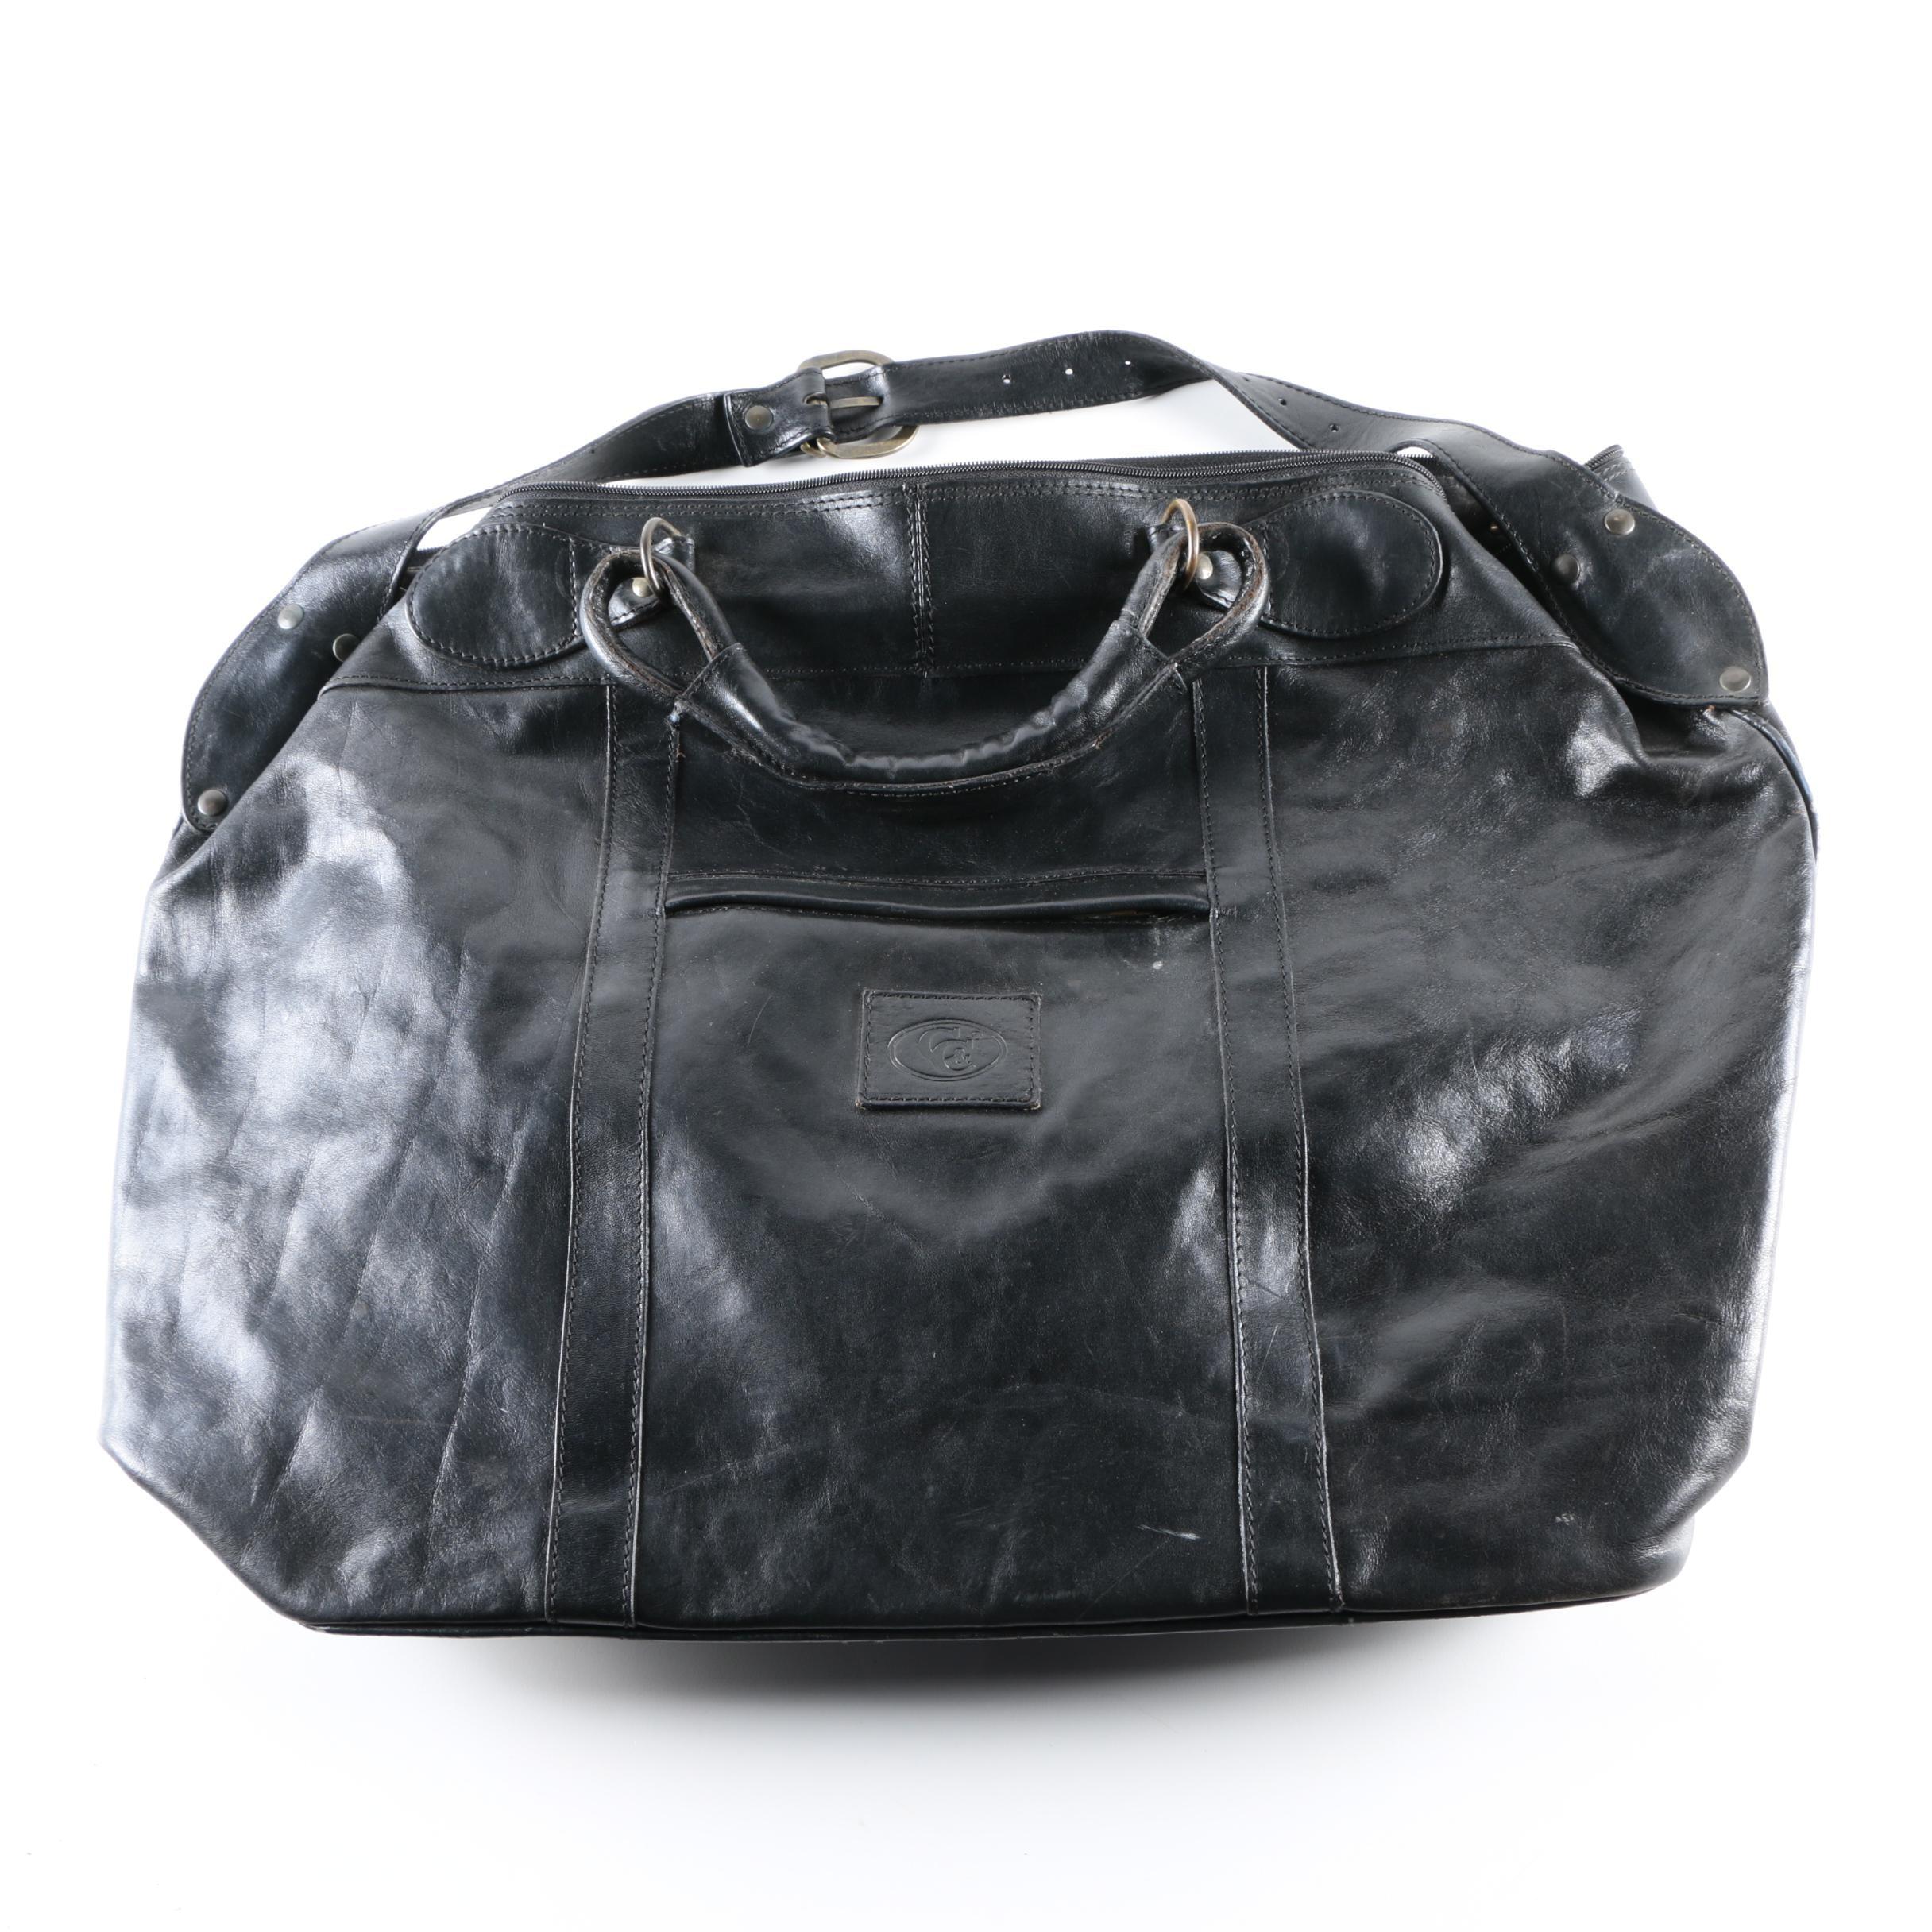 C&C Black Leather Overnight Bag